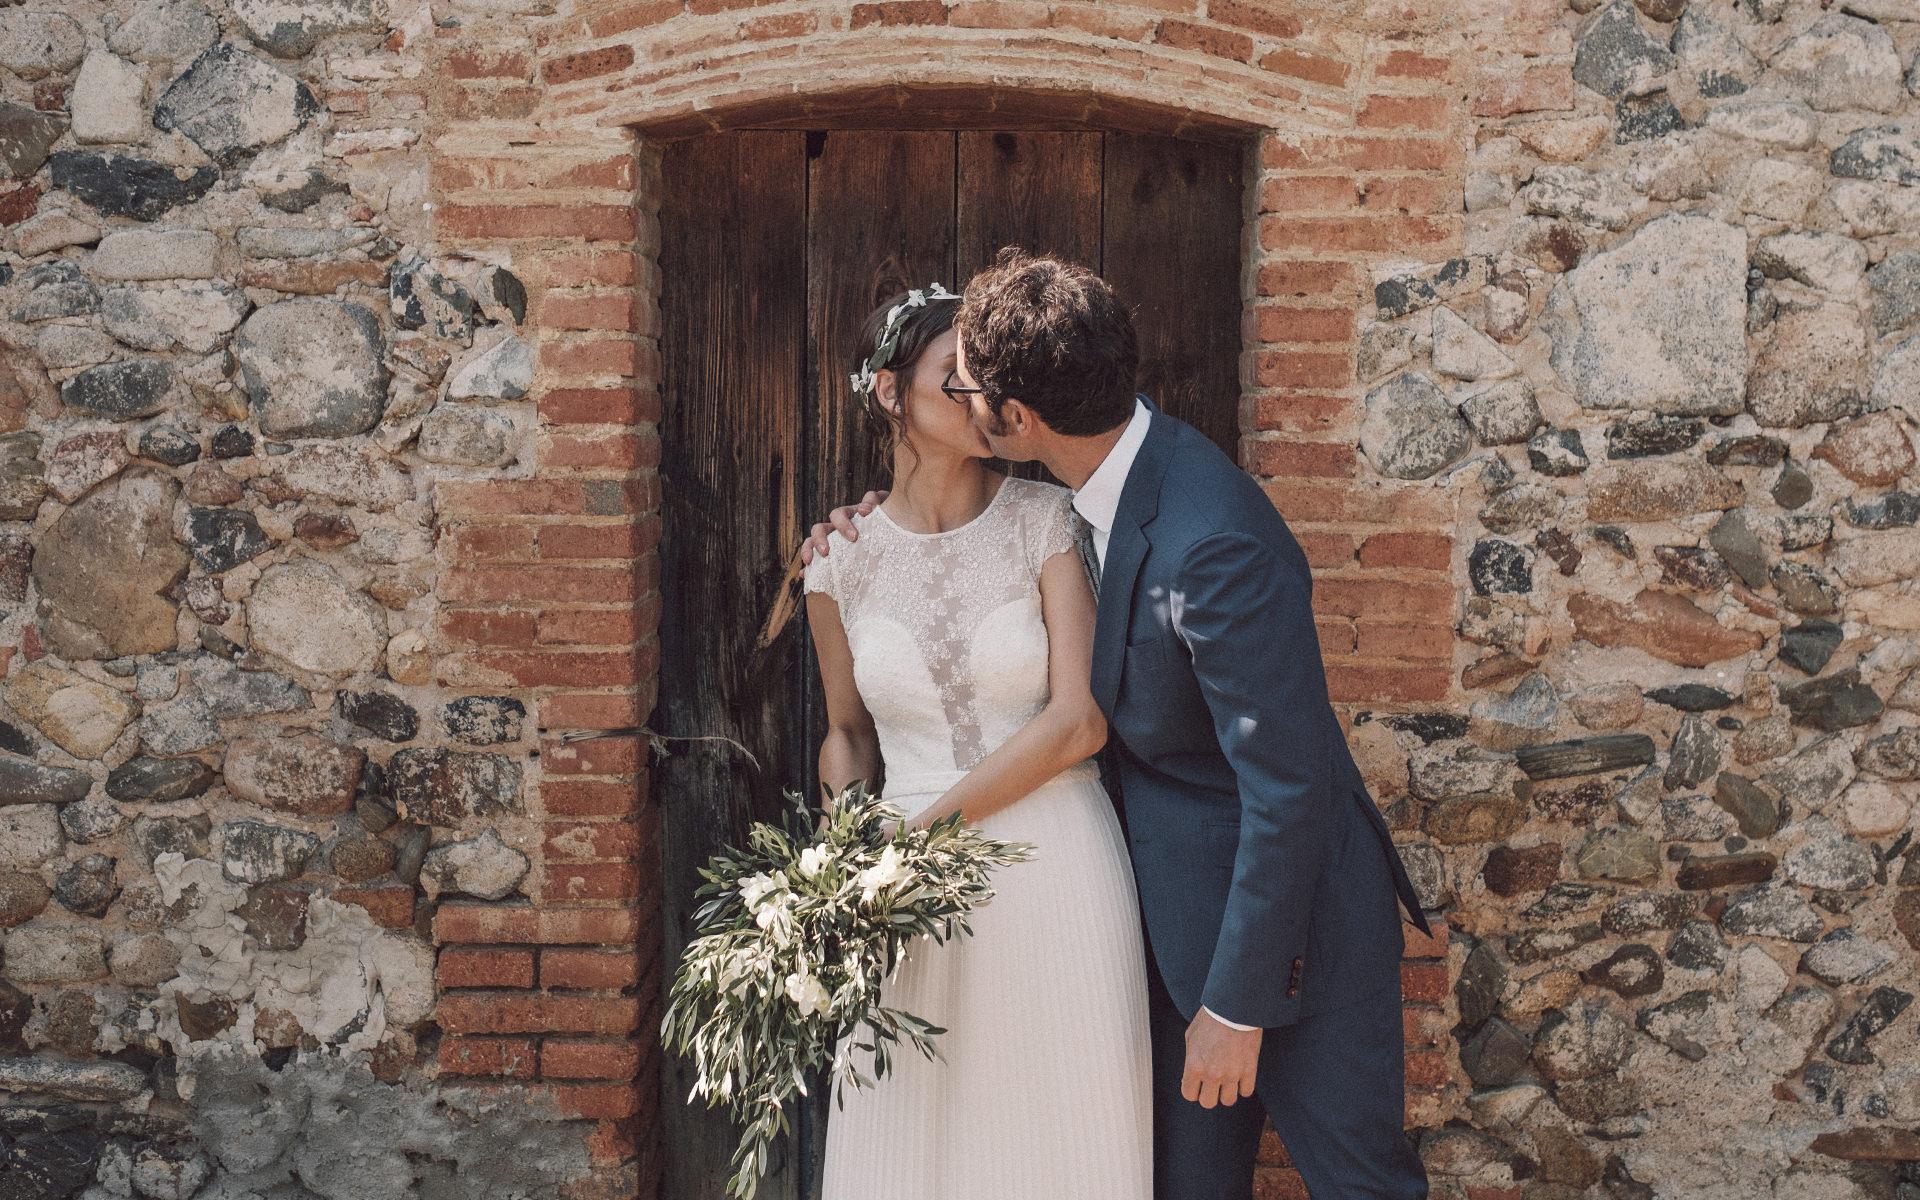 Fotógrafo de bodas Barcelona, fotografía de bodas en Girona, Tarragona, Lleida. Fotografía de boda íntima. Wedding photographer